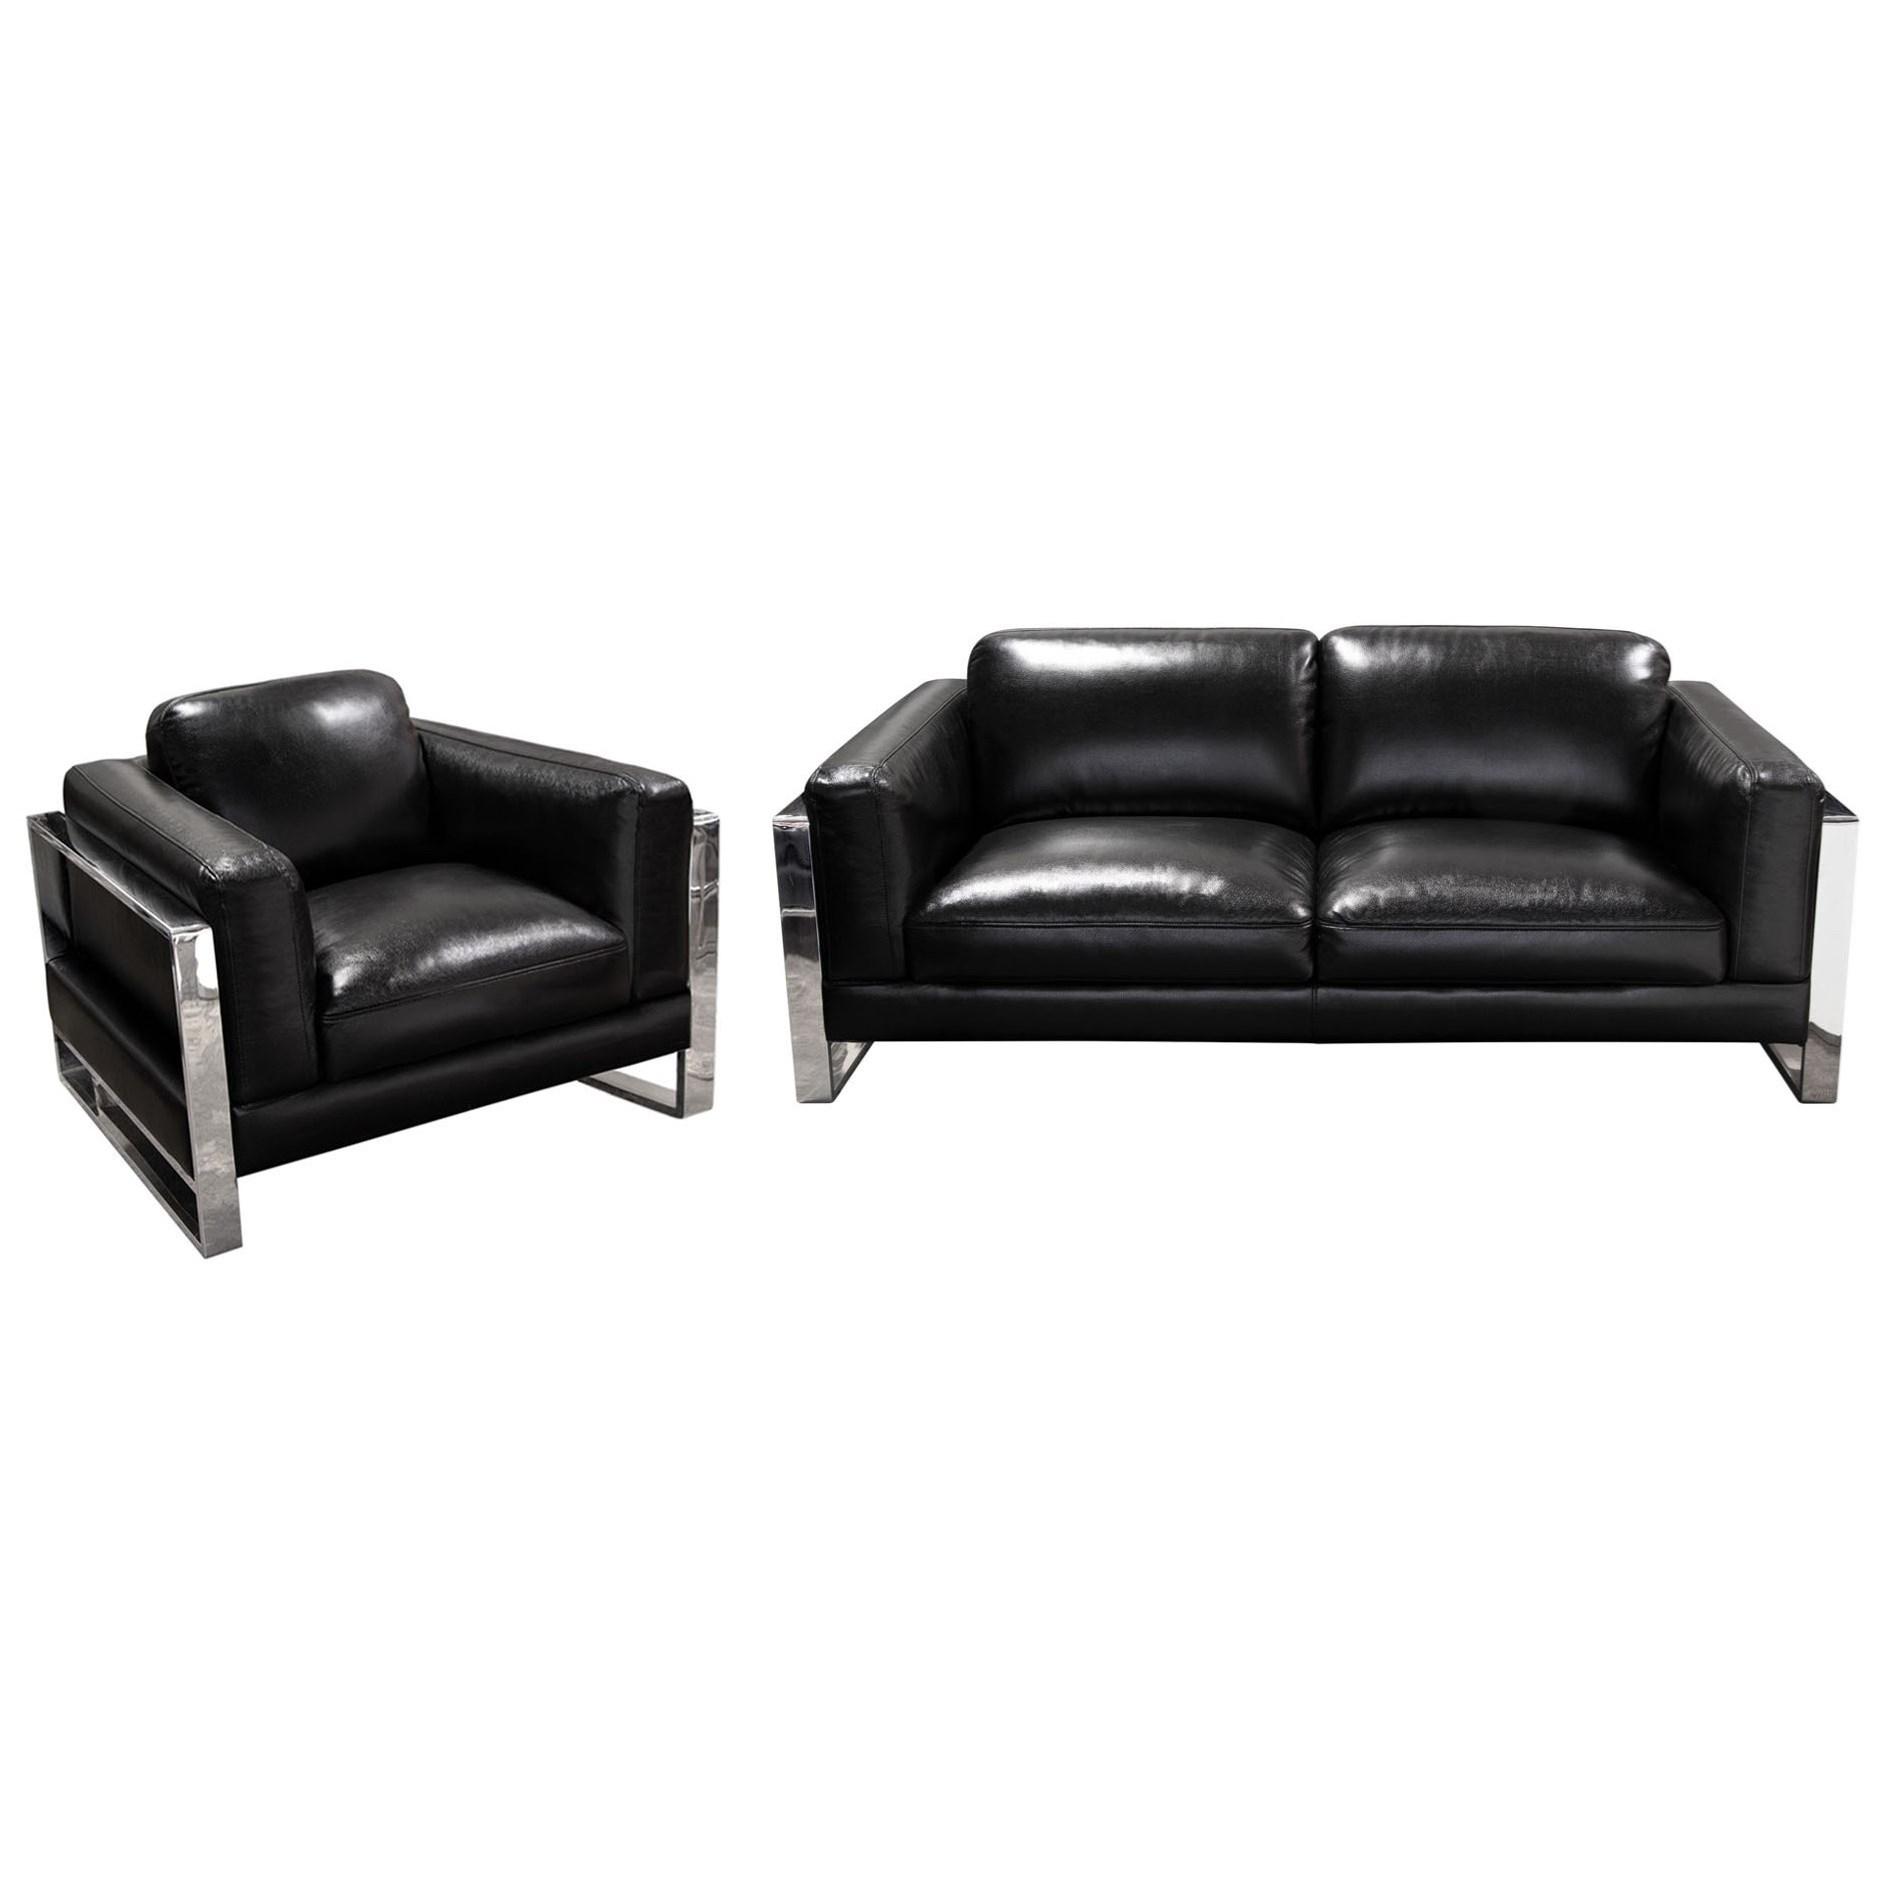 Diamond Sofa Annika Sofa and Chair Package - Item Number: ANNIKASCBL